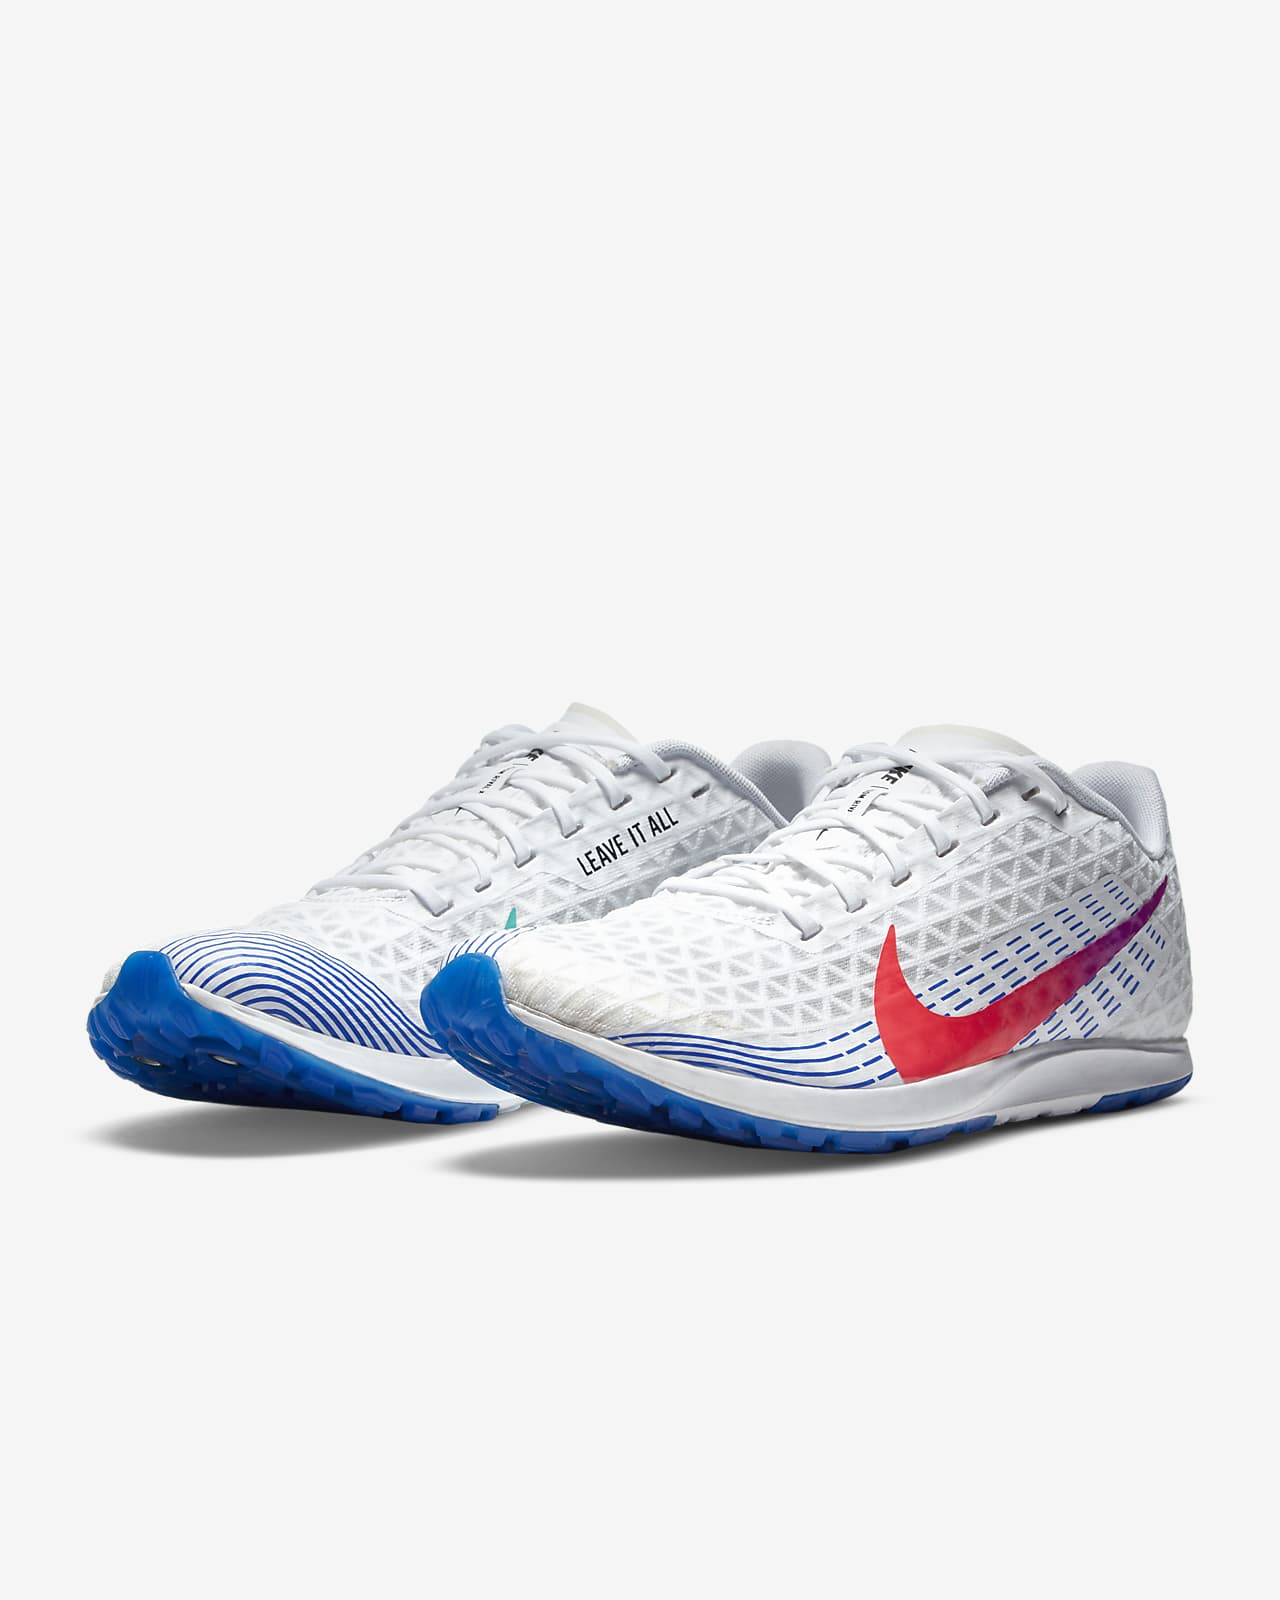 Nike Zoom Rival XC (2019) Unisex Track